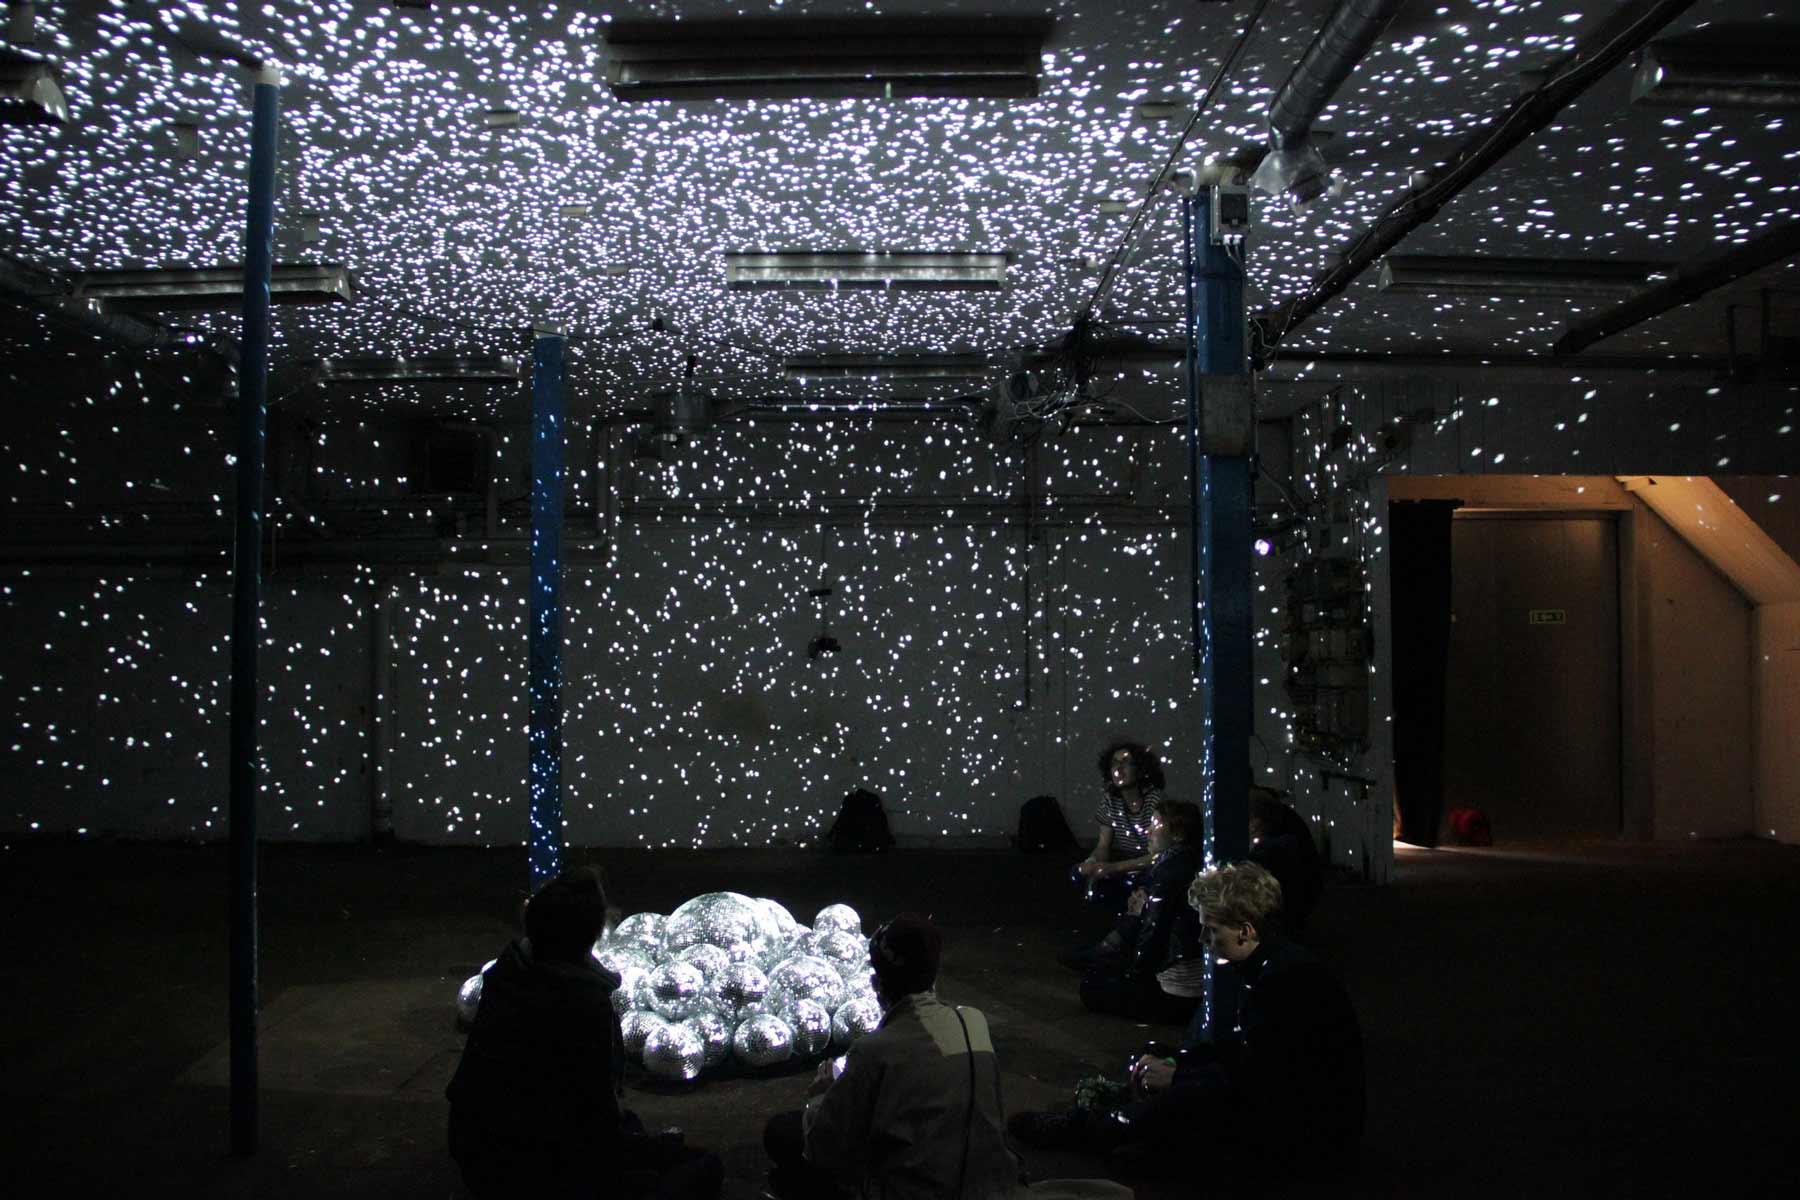 50 Discokugeln in einem Raum light-leaks-discokugeln_04